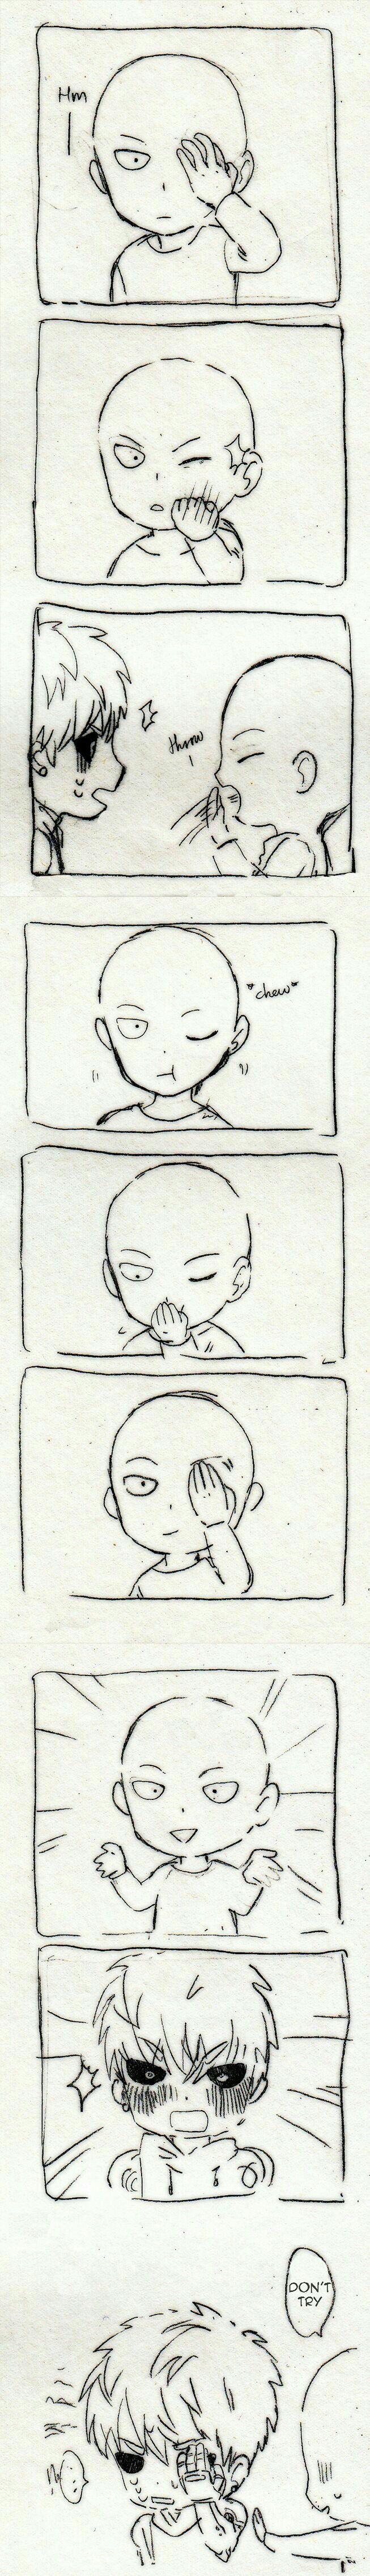 Genos, Saitama, comic, text, funny, magic trick, popping eye, cute, chibi; One Punch Man